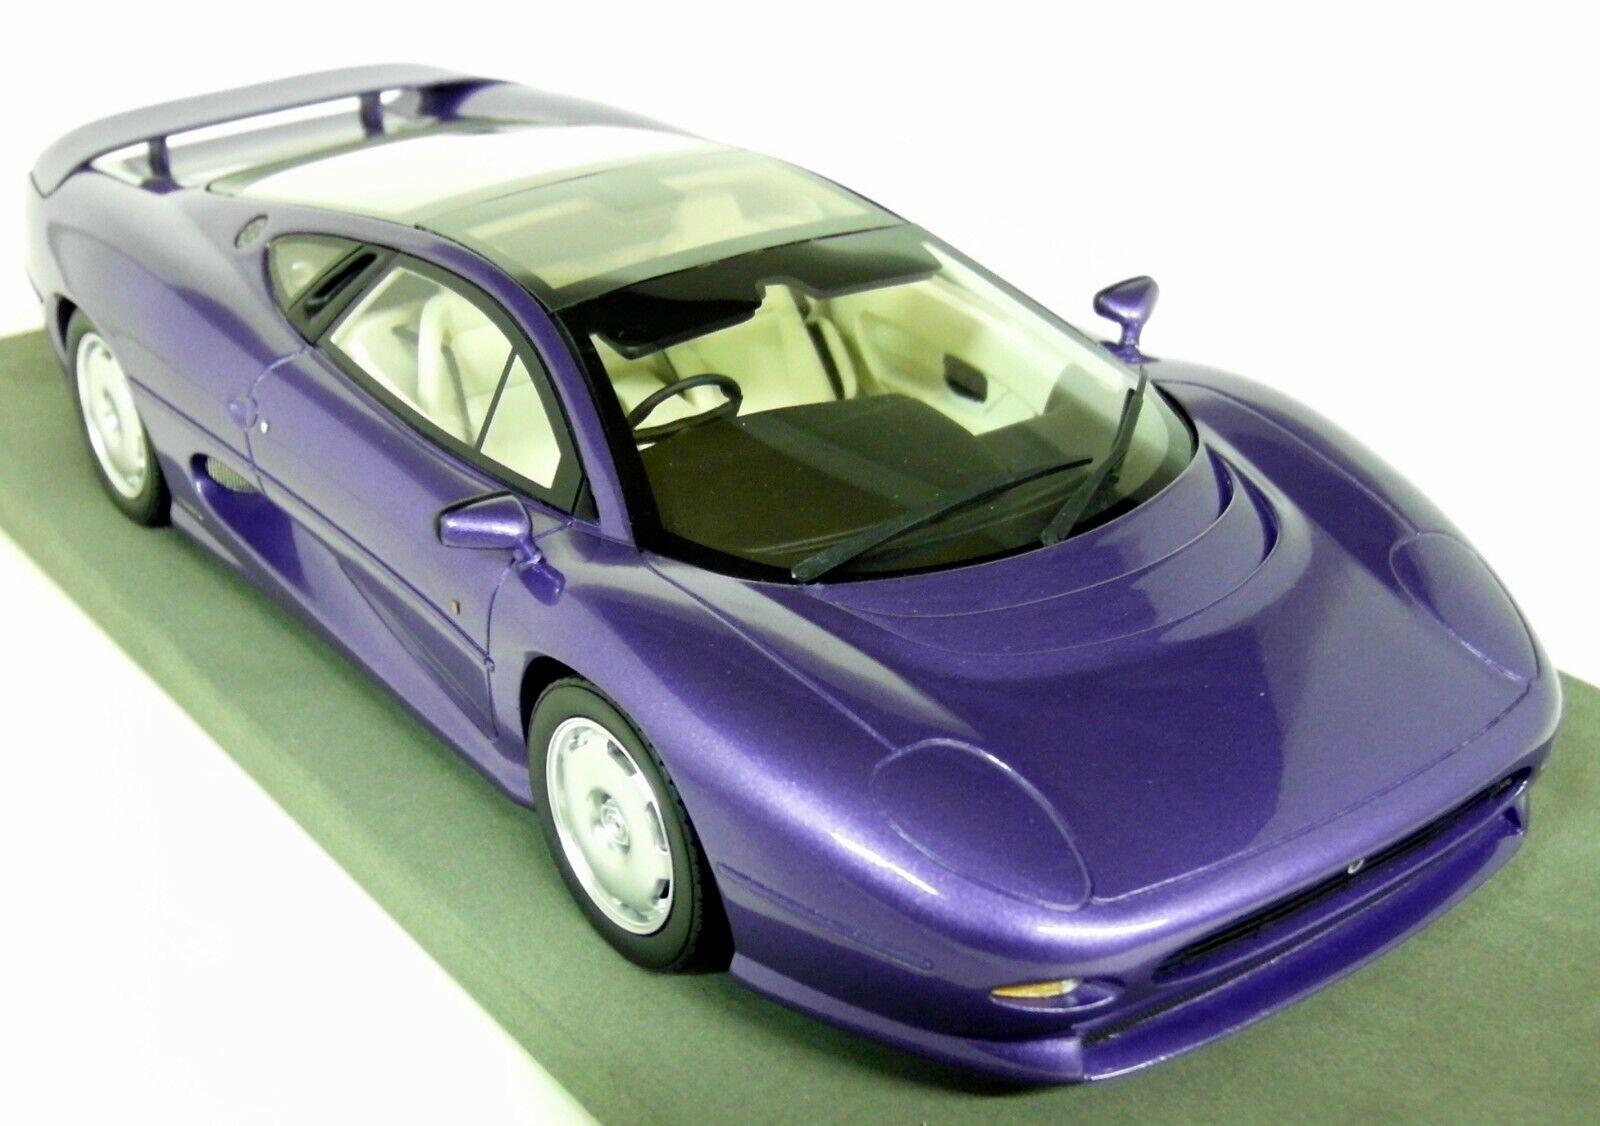 Top Marques 1 18 Scale - Jaguar XJ 220 Metallic Purple High End Resin Model Car